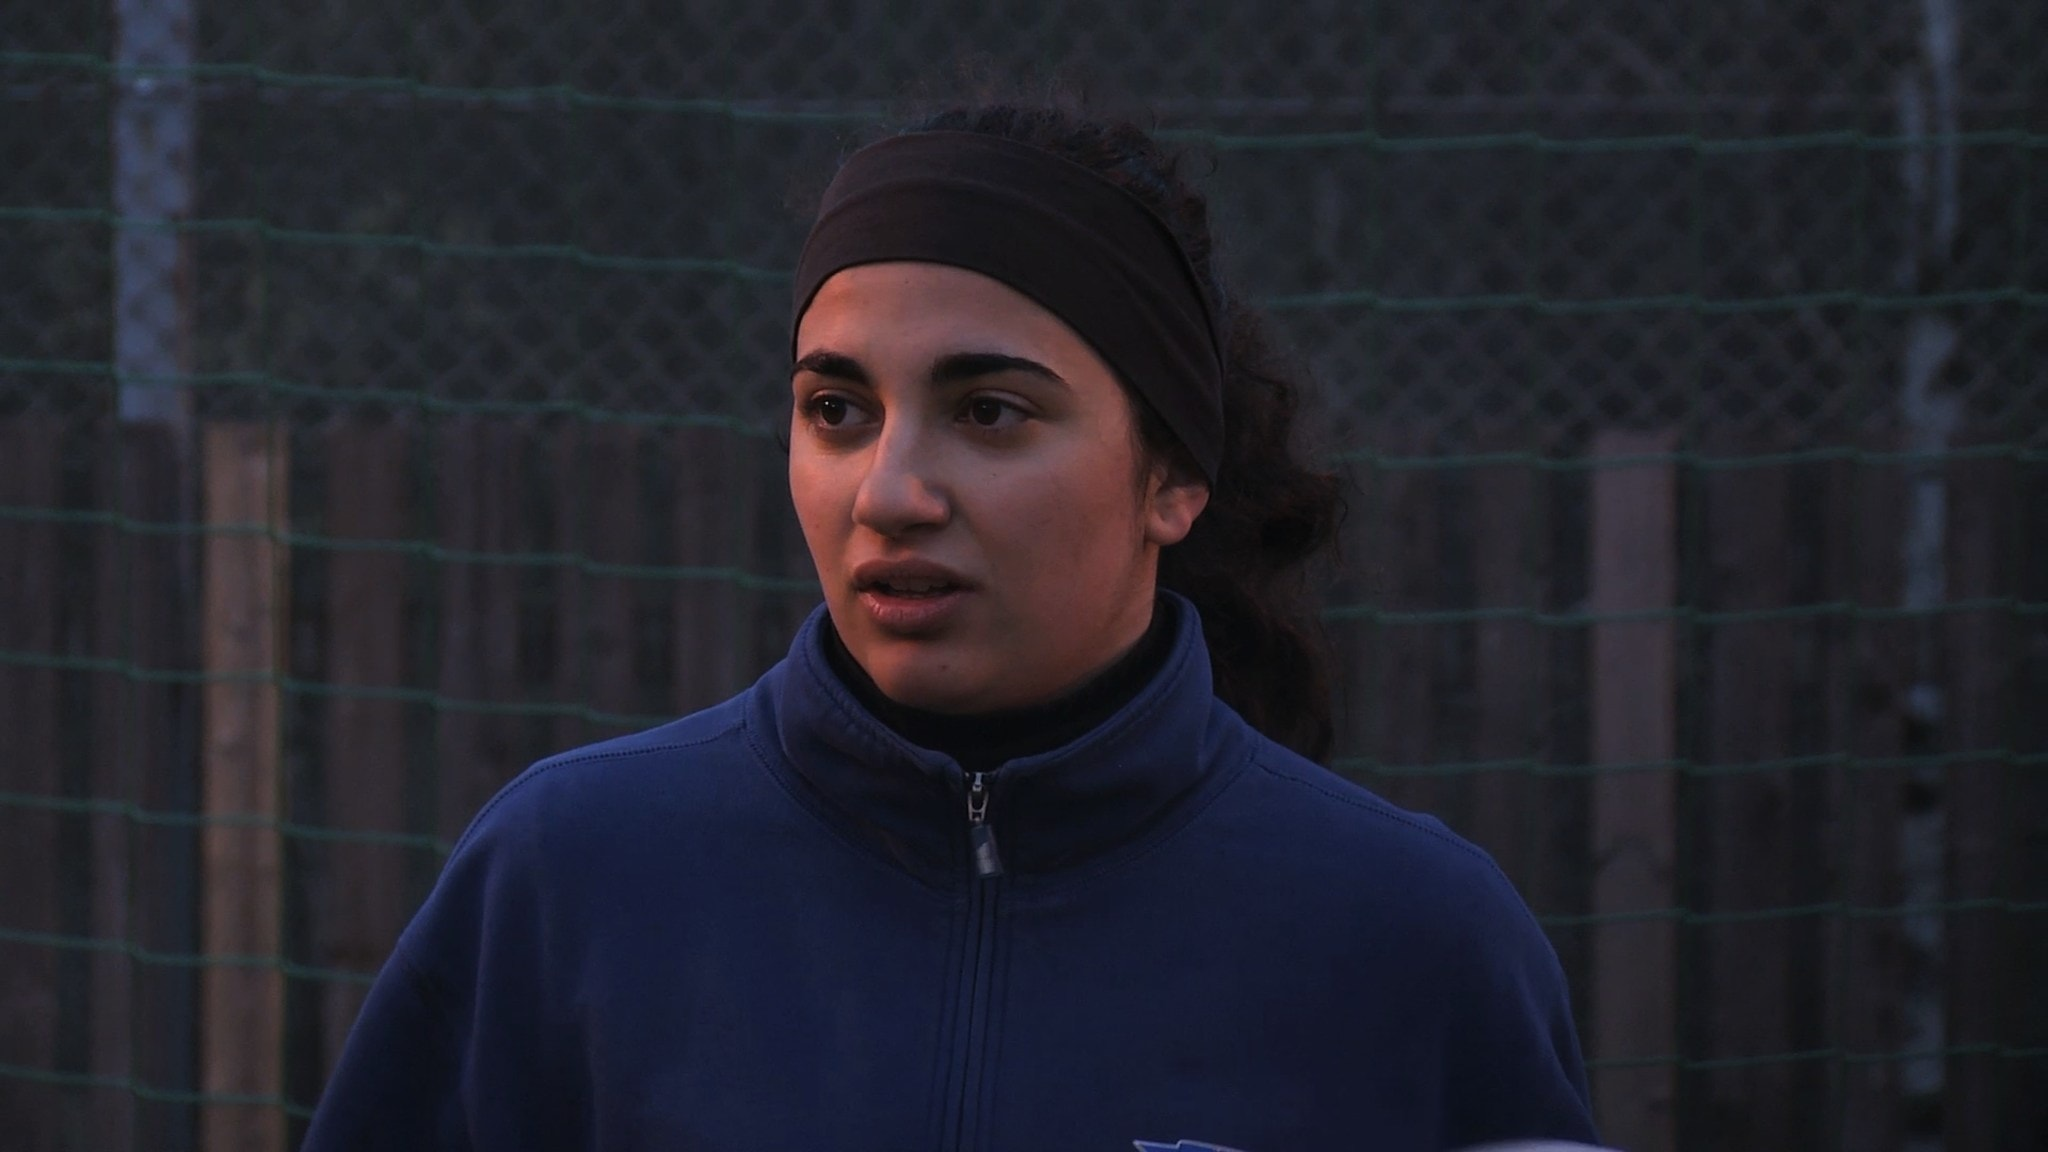 Simona Hanoun, Angereds Zlatan